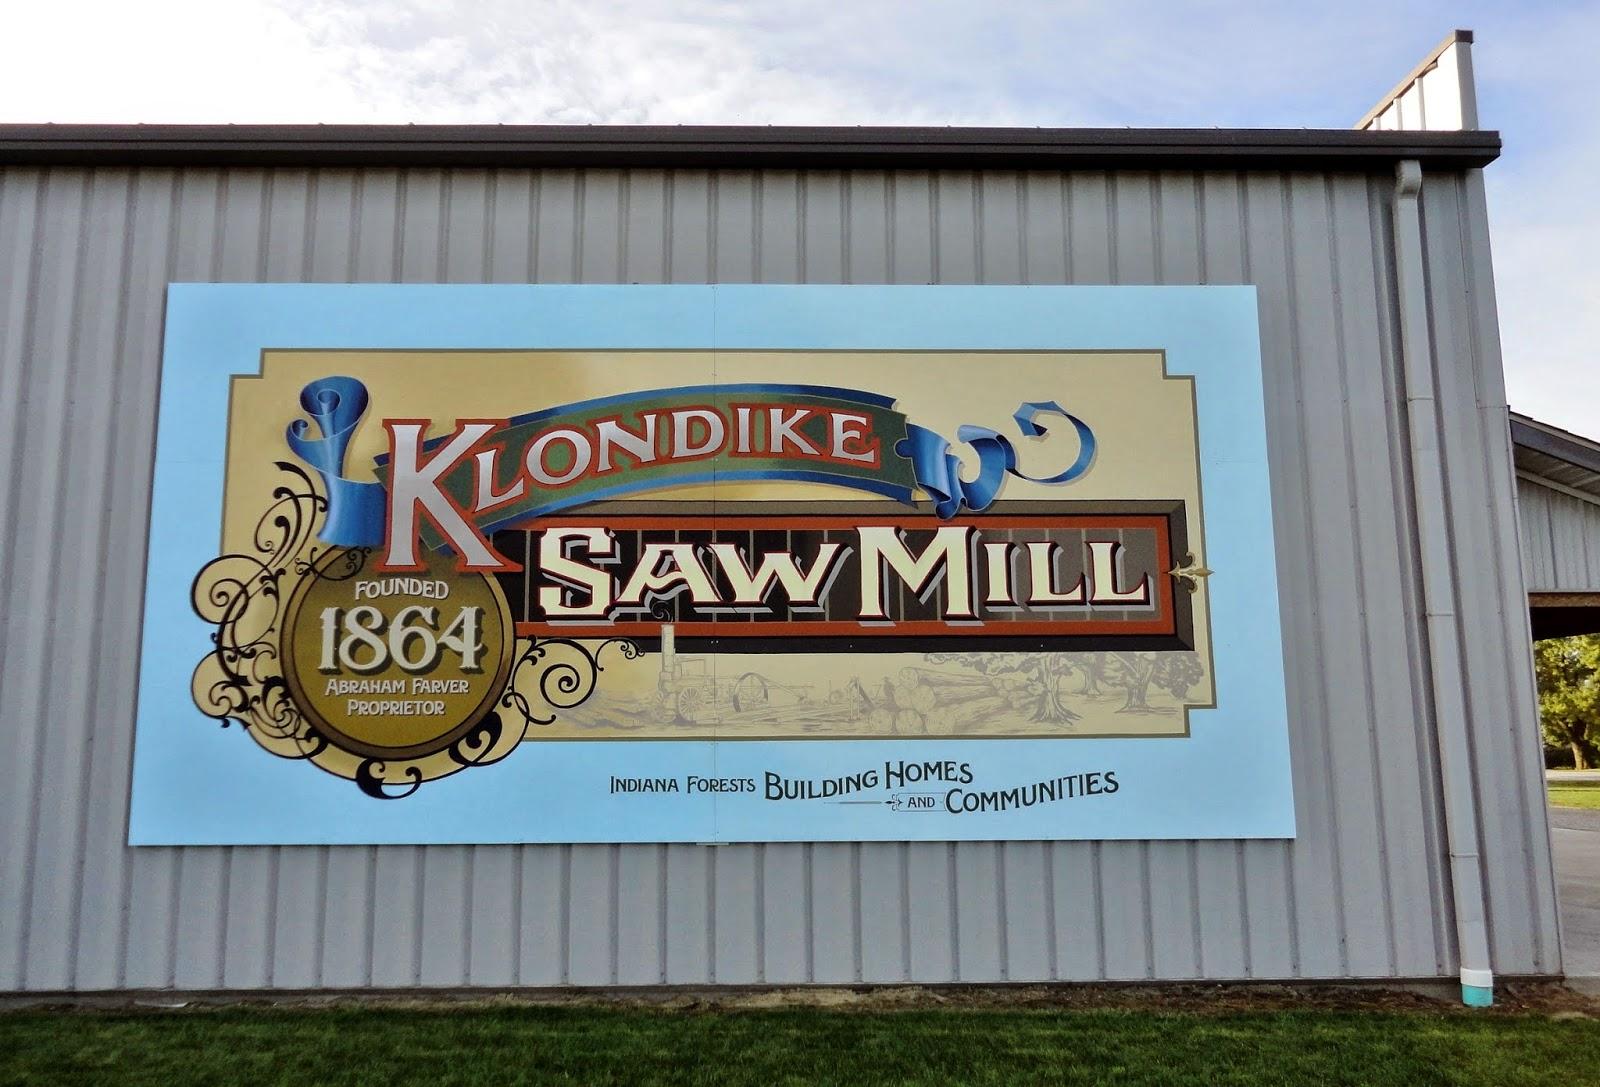 My Amish Indiana Shipshewana Walldogs Part Eleven The Klondike